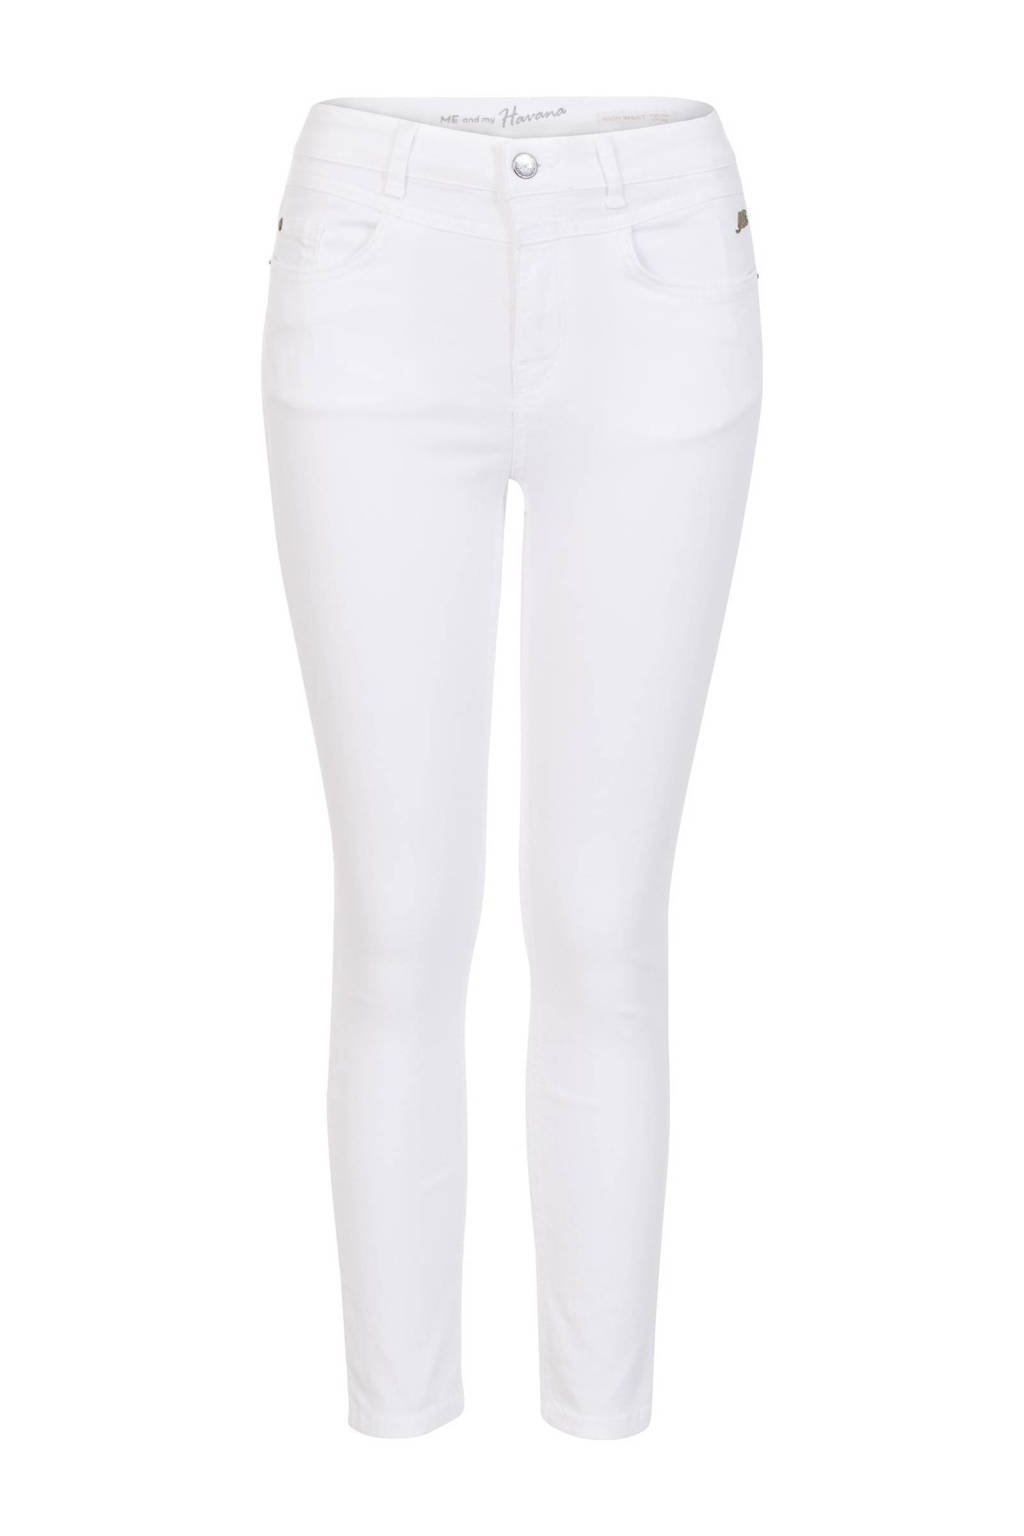 Miss Etam Regulier high waist skinny jeans wit, Wit